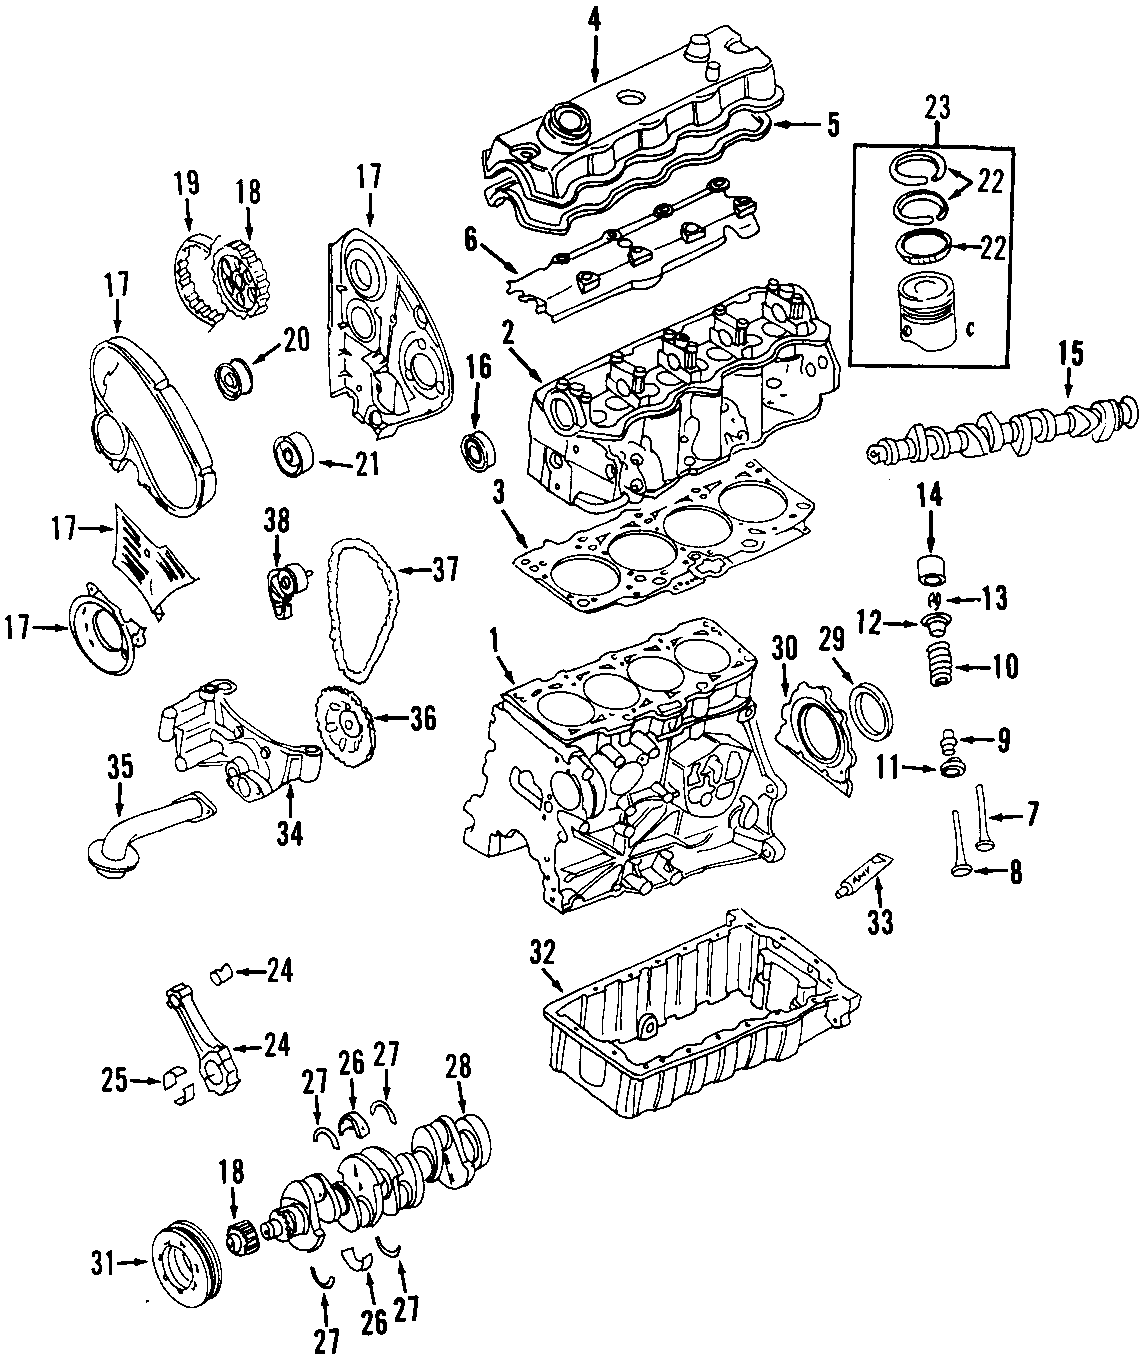 2001 Volkswagen Beetle Engine Timing Belt Tensioner